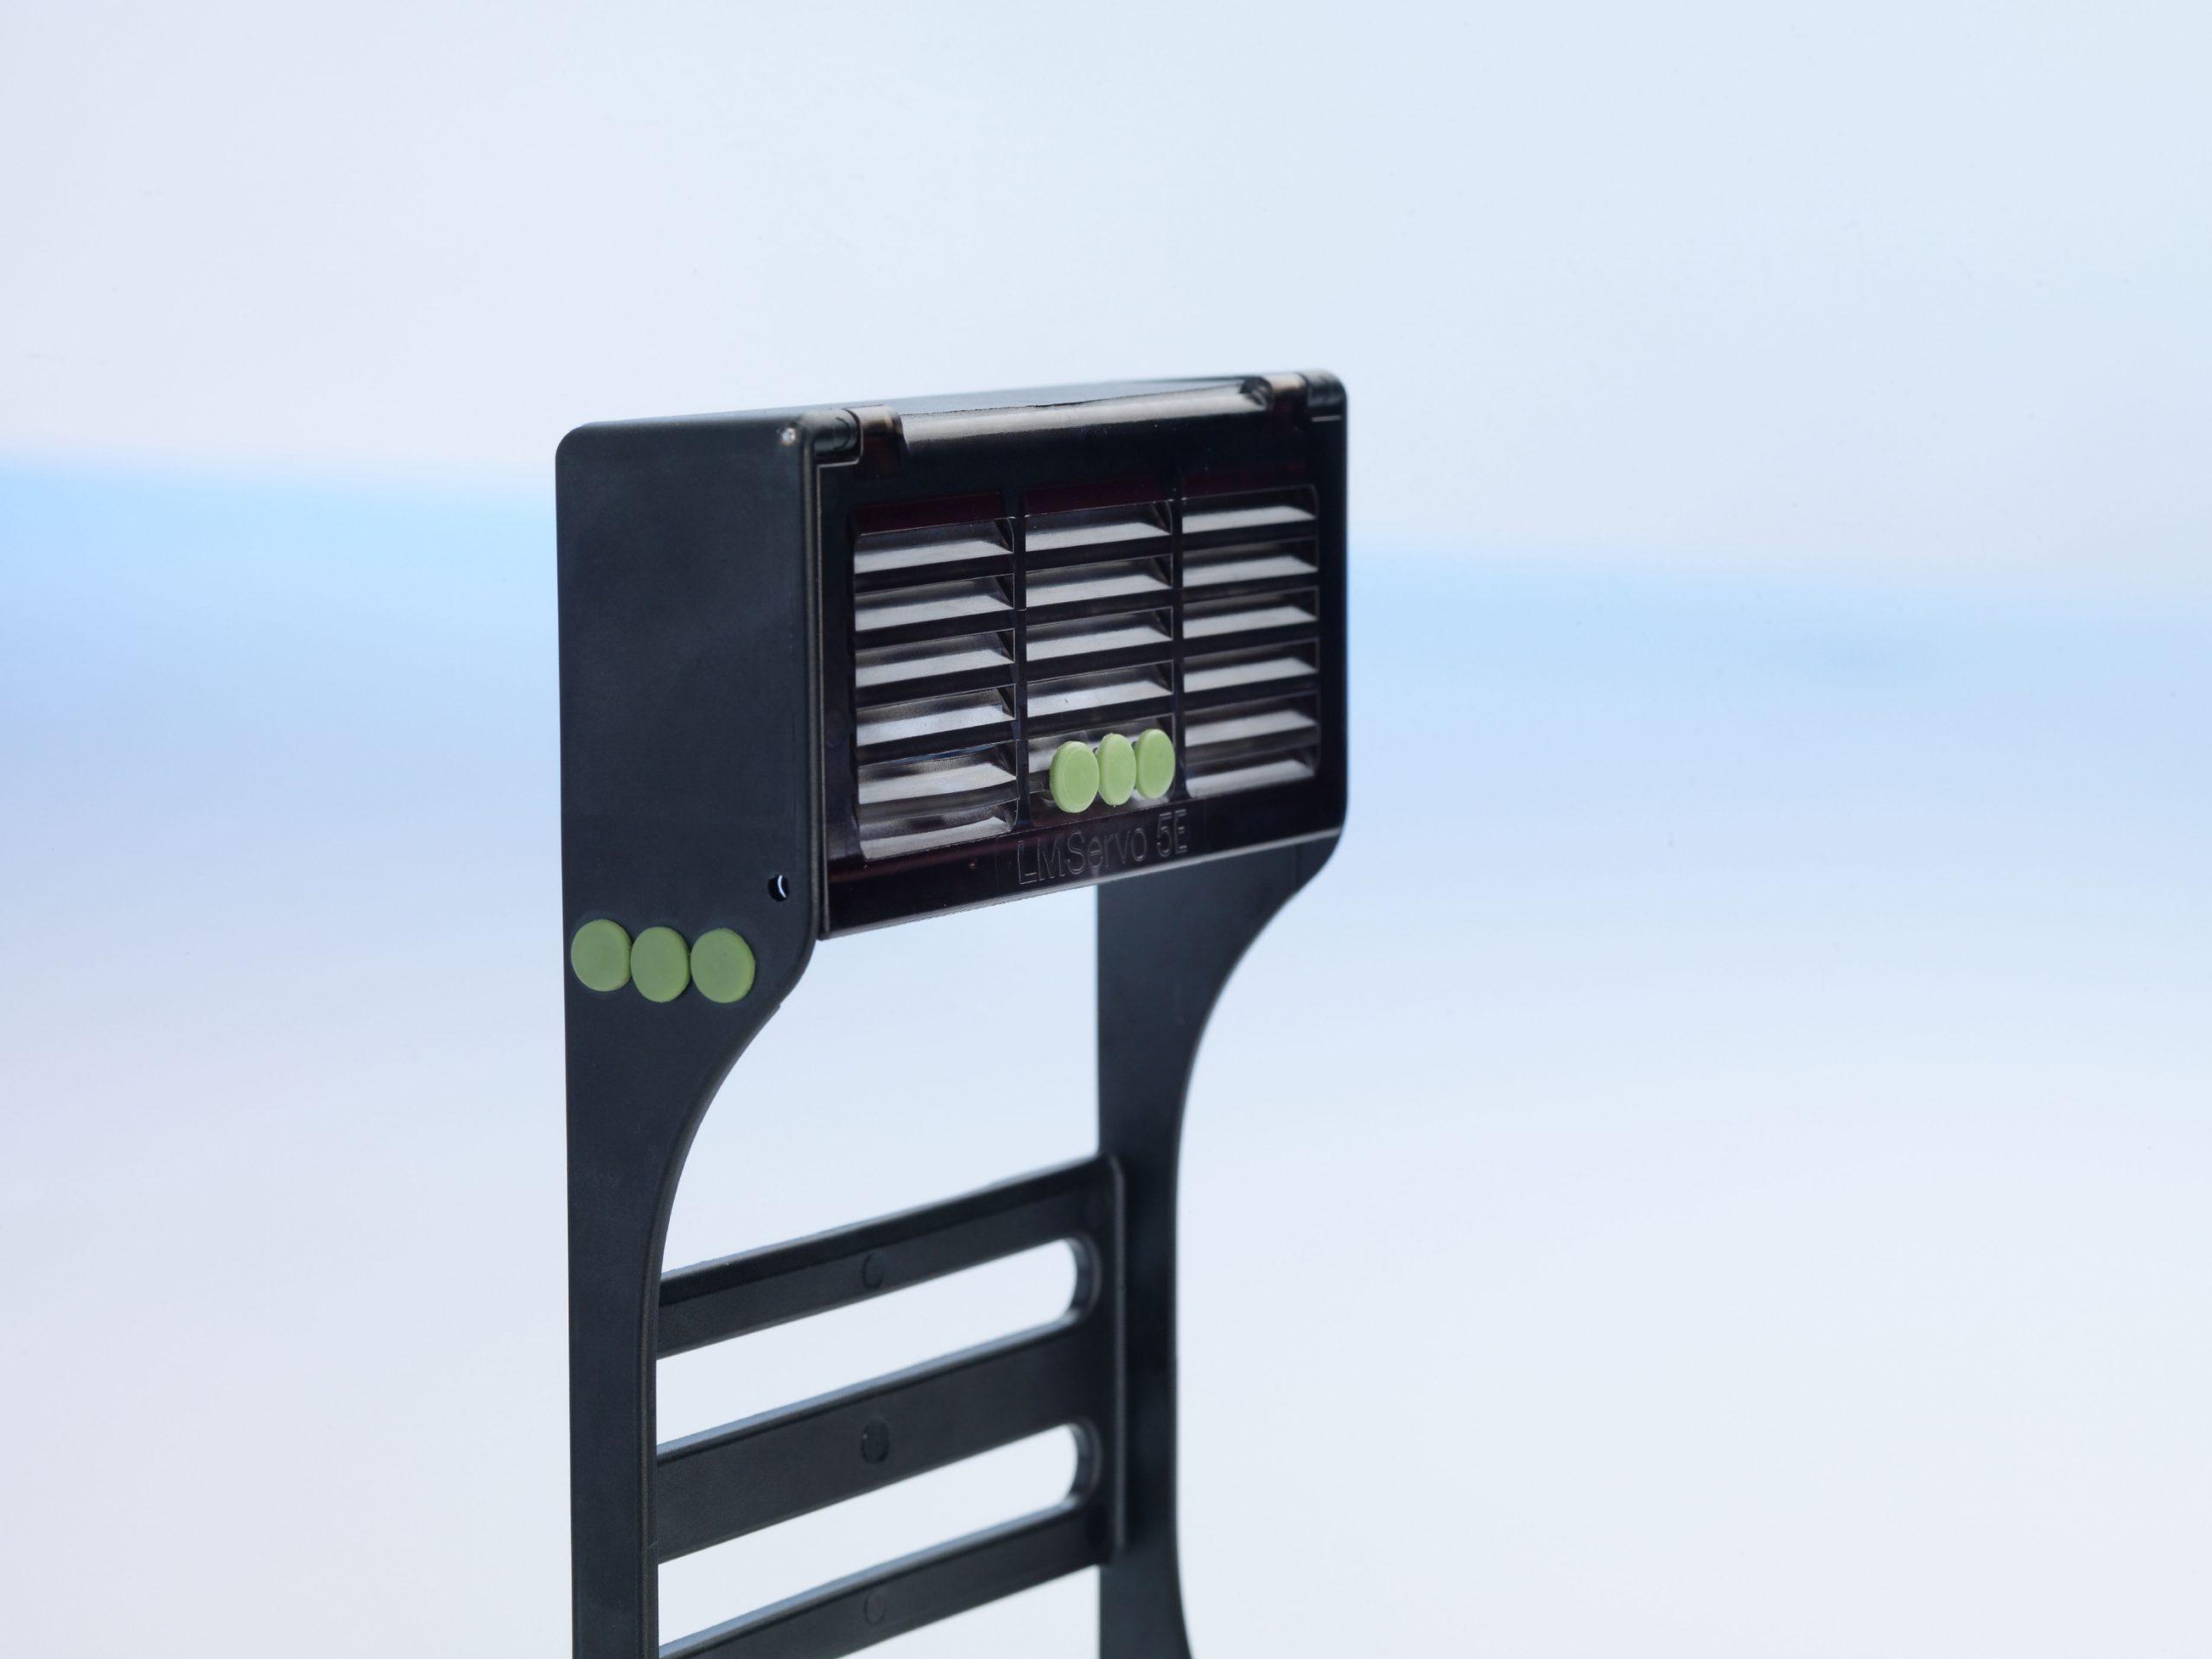 LM-Servo E code buttons